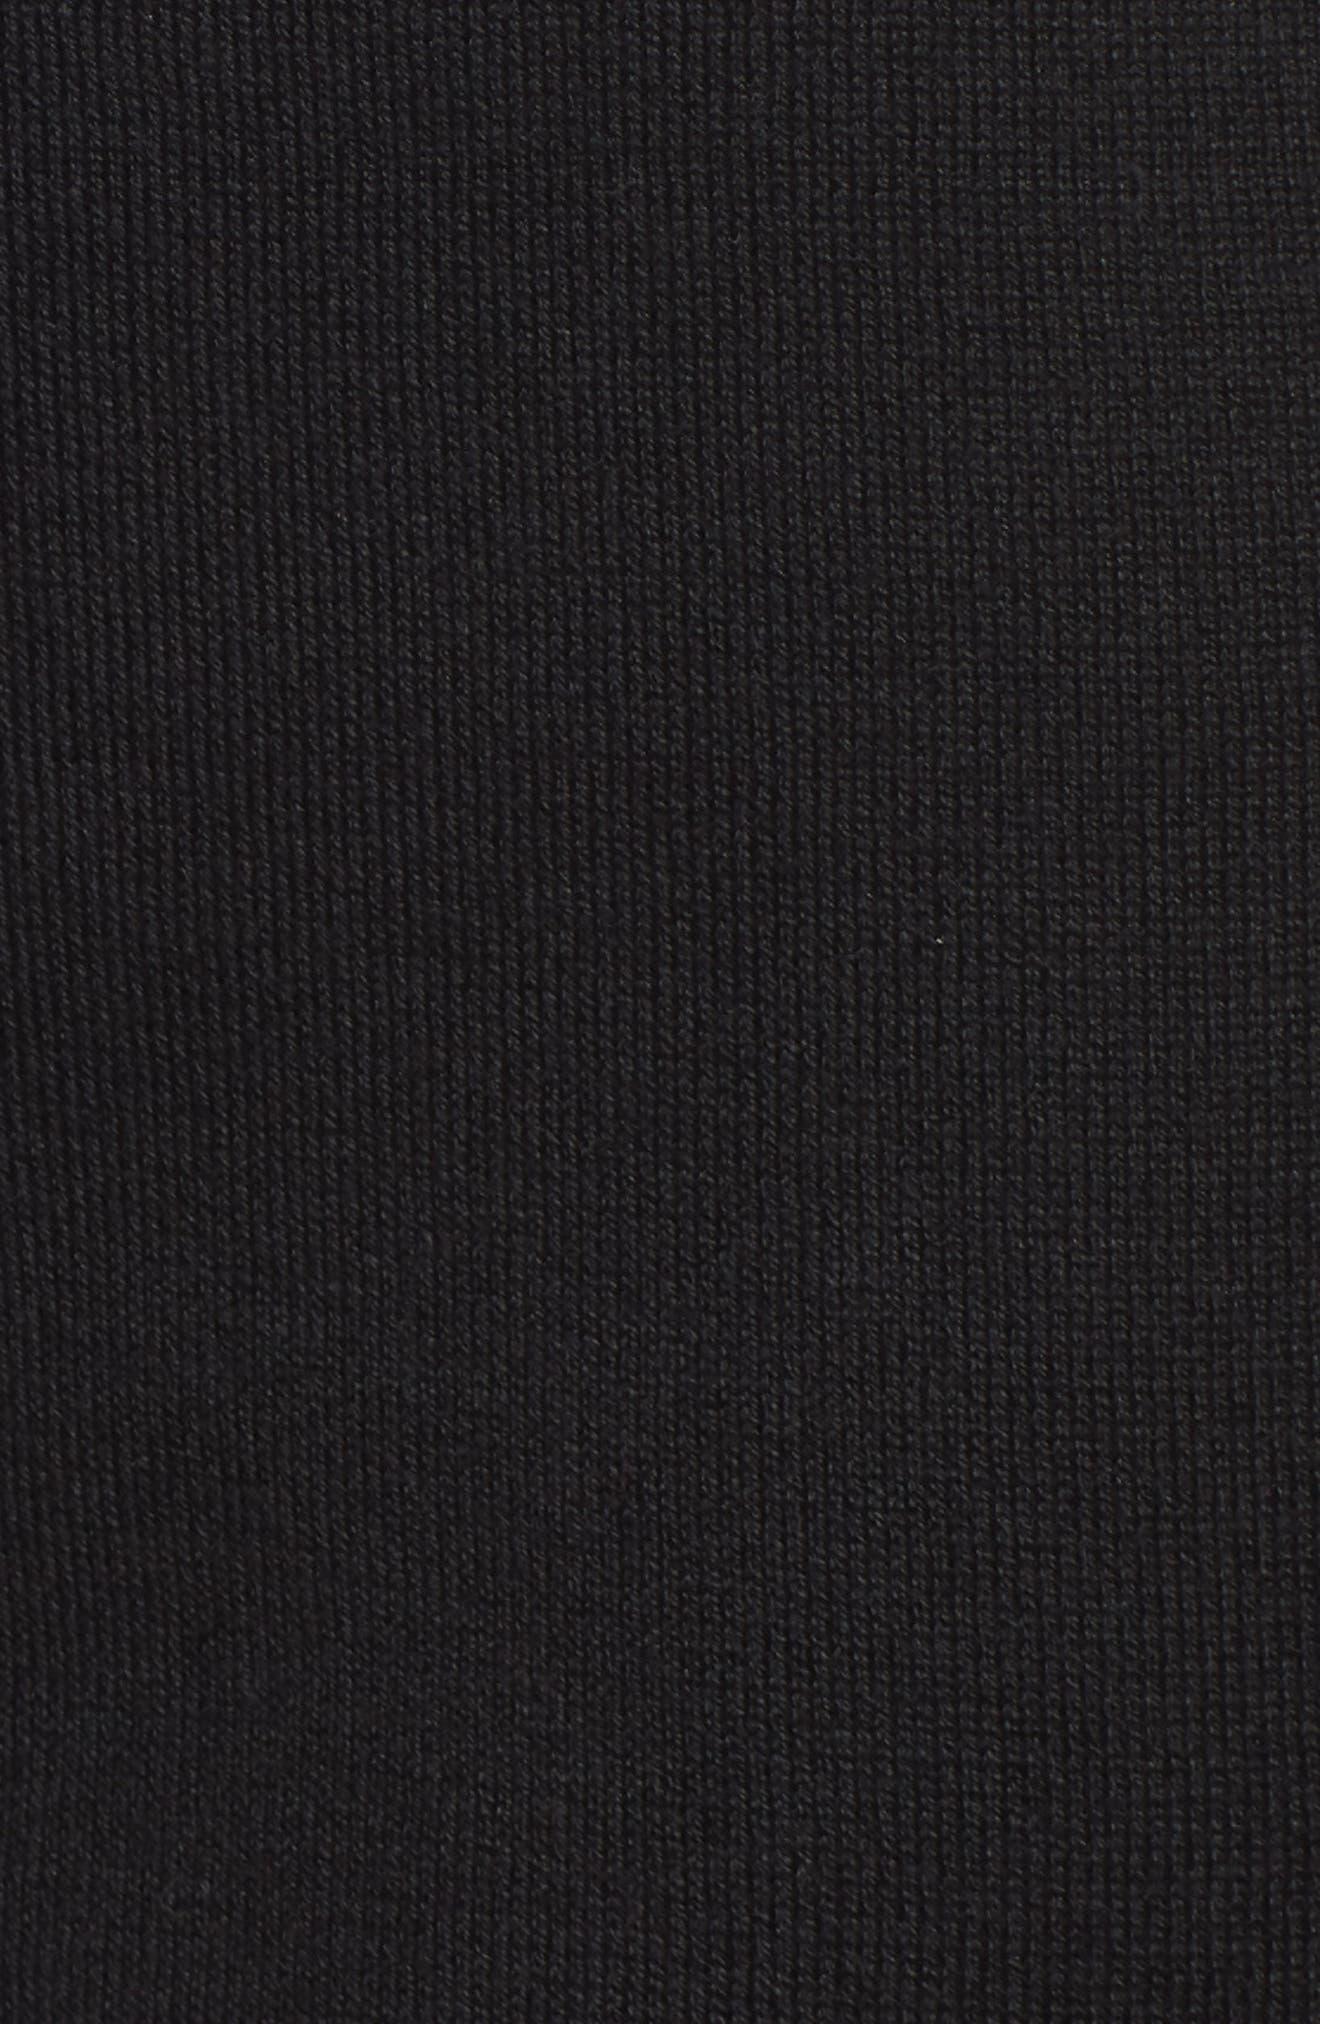 Knit Ankle Pants,                             Alternate thumbnail 6, color,                             BLACK